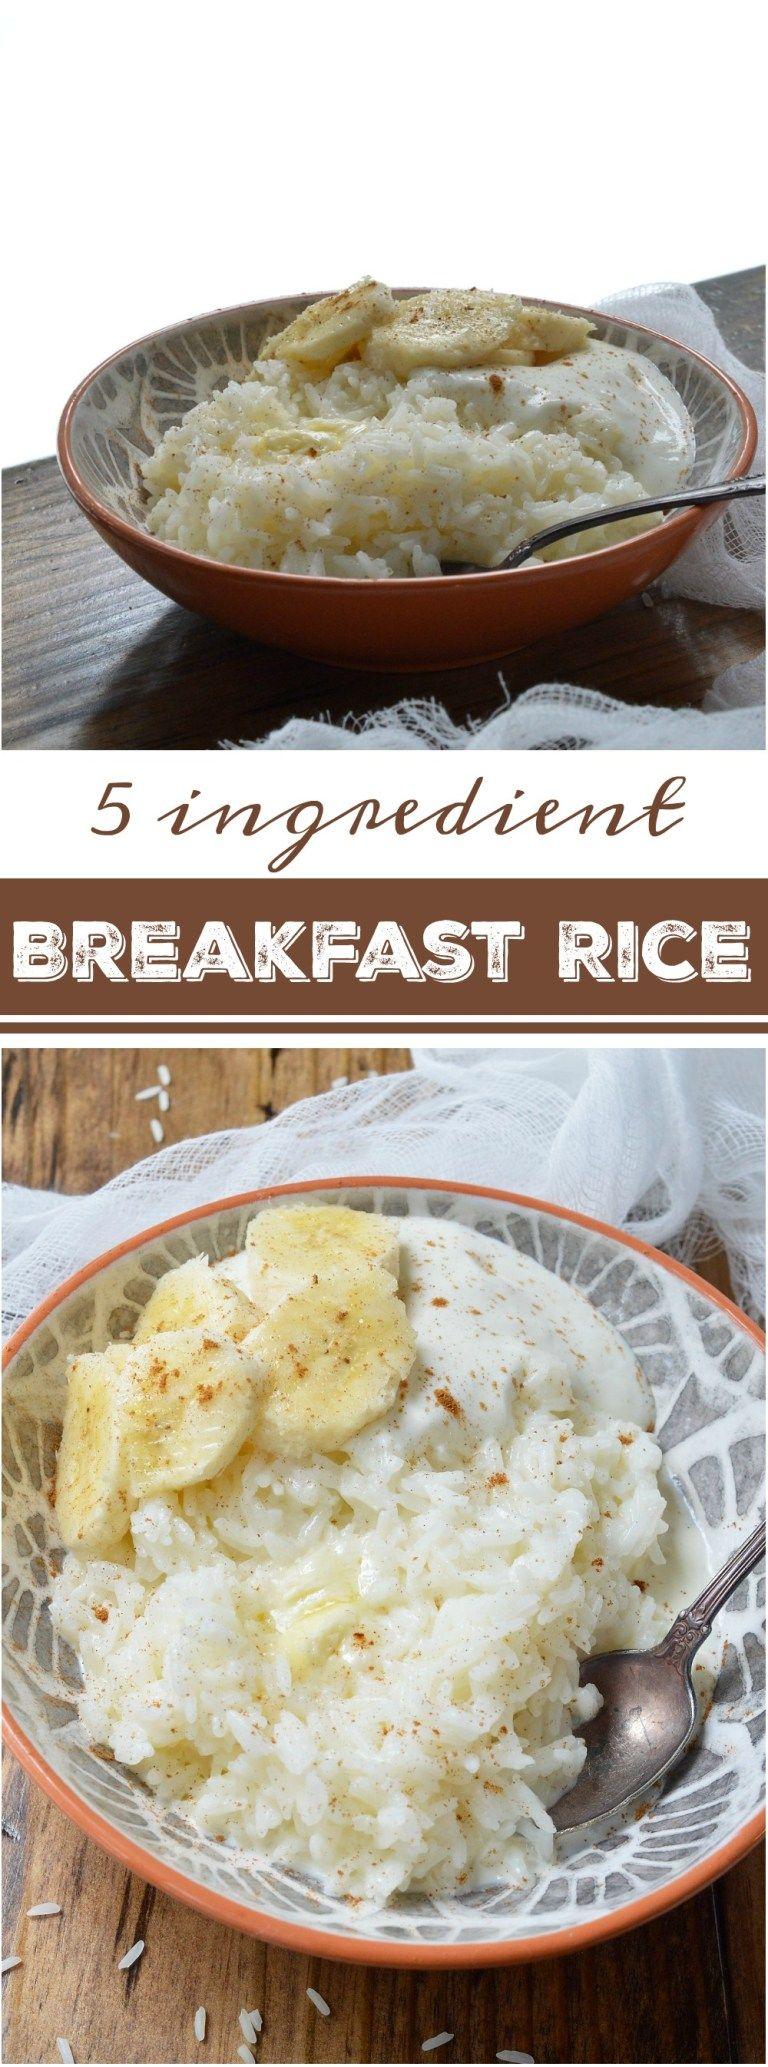 5 Ingredient Breakfast Rice #whitericerecipes